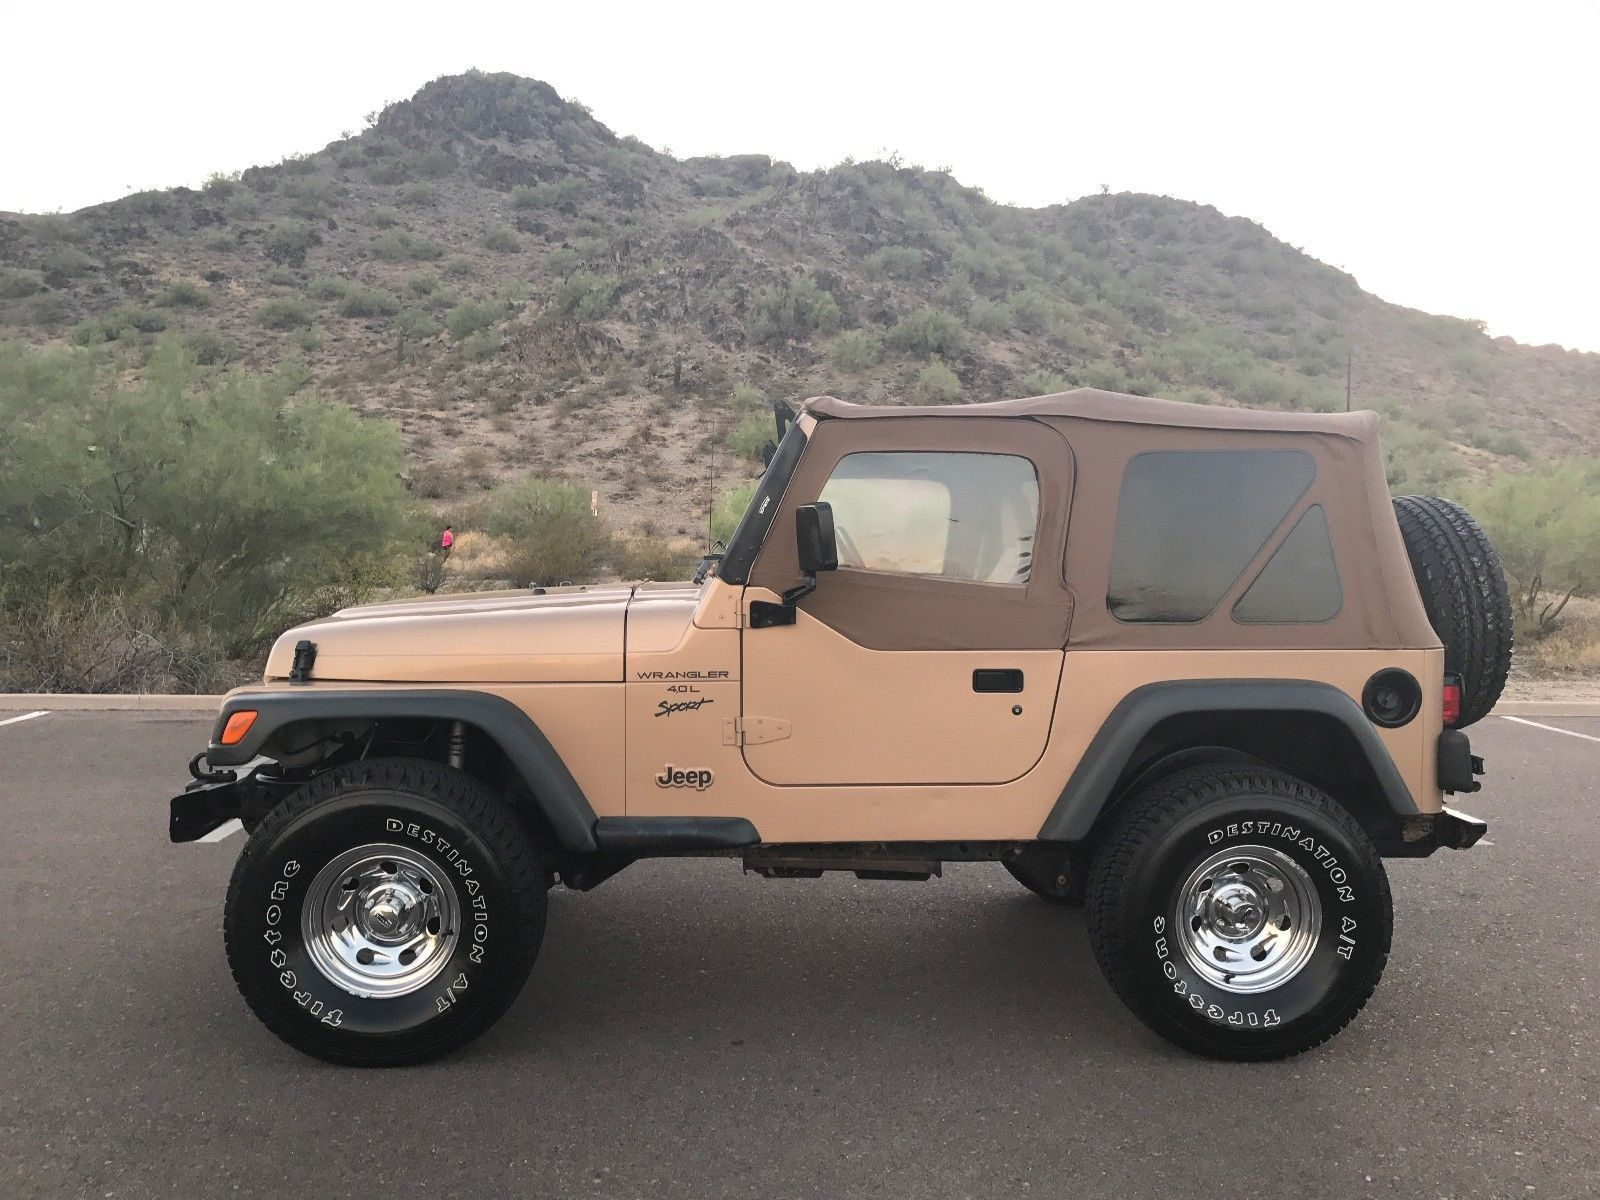 eBay: 1999 Jeep Wrangler 1999 Jeep Wrangler Sport 4.0L TJ Manual RUST FREE  AZ LOW MILES! #jeep #jeeplife